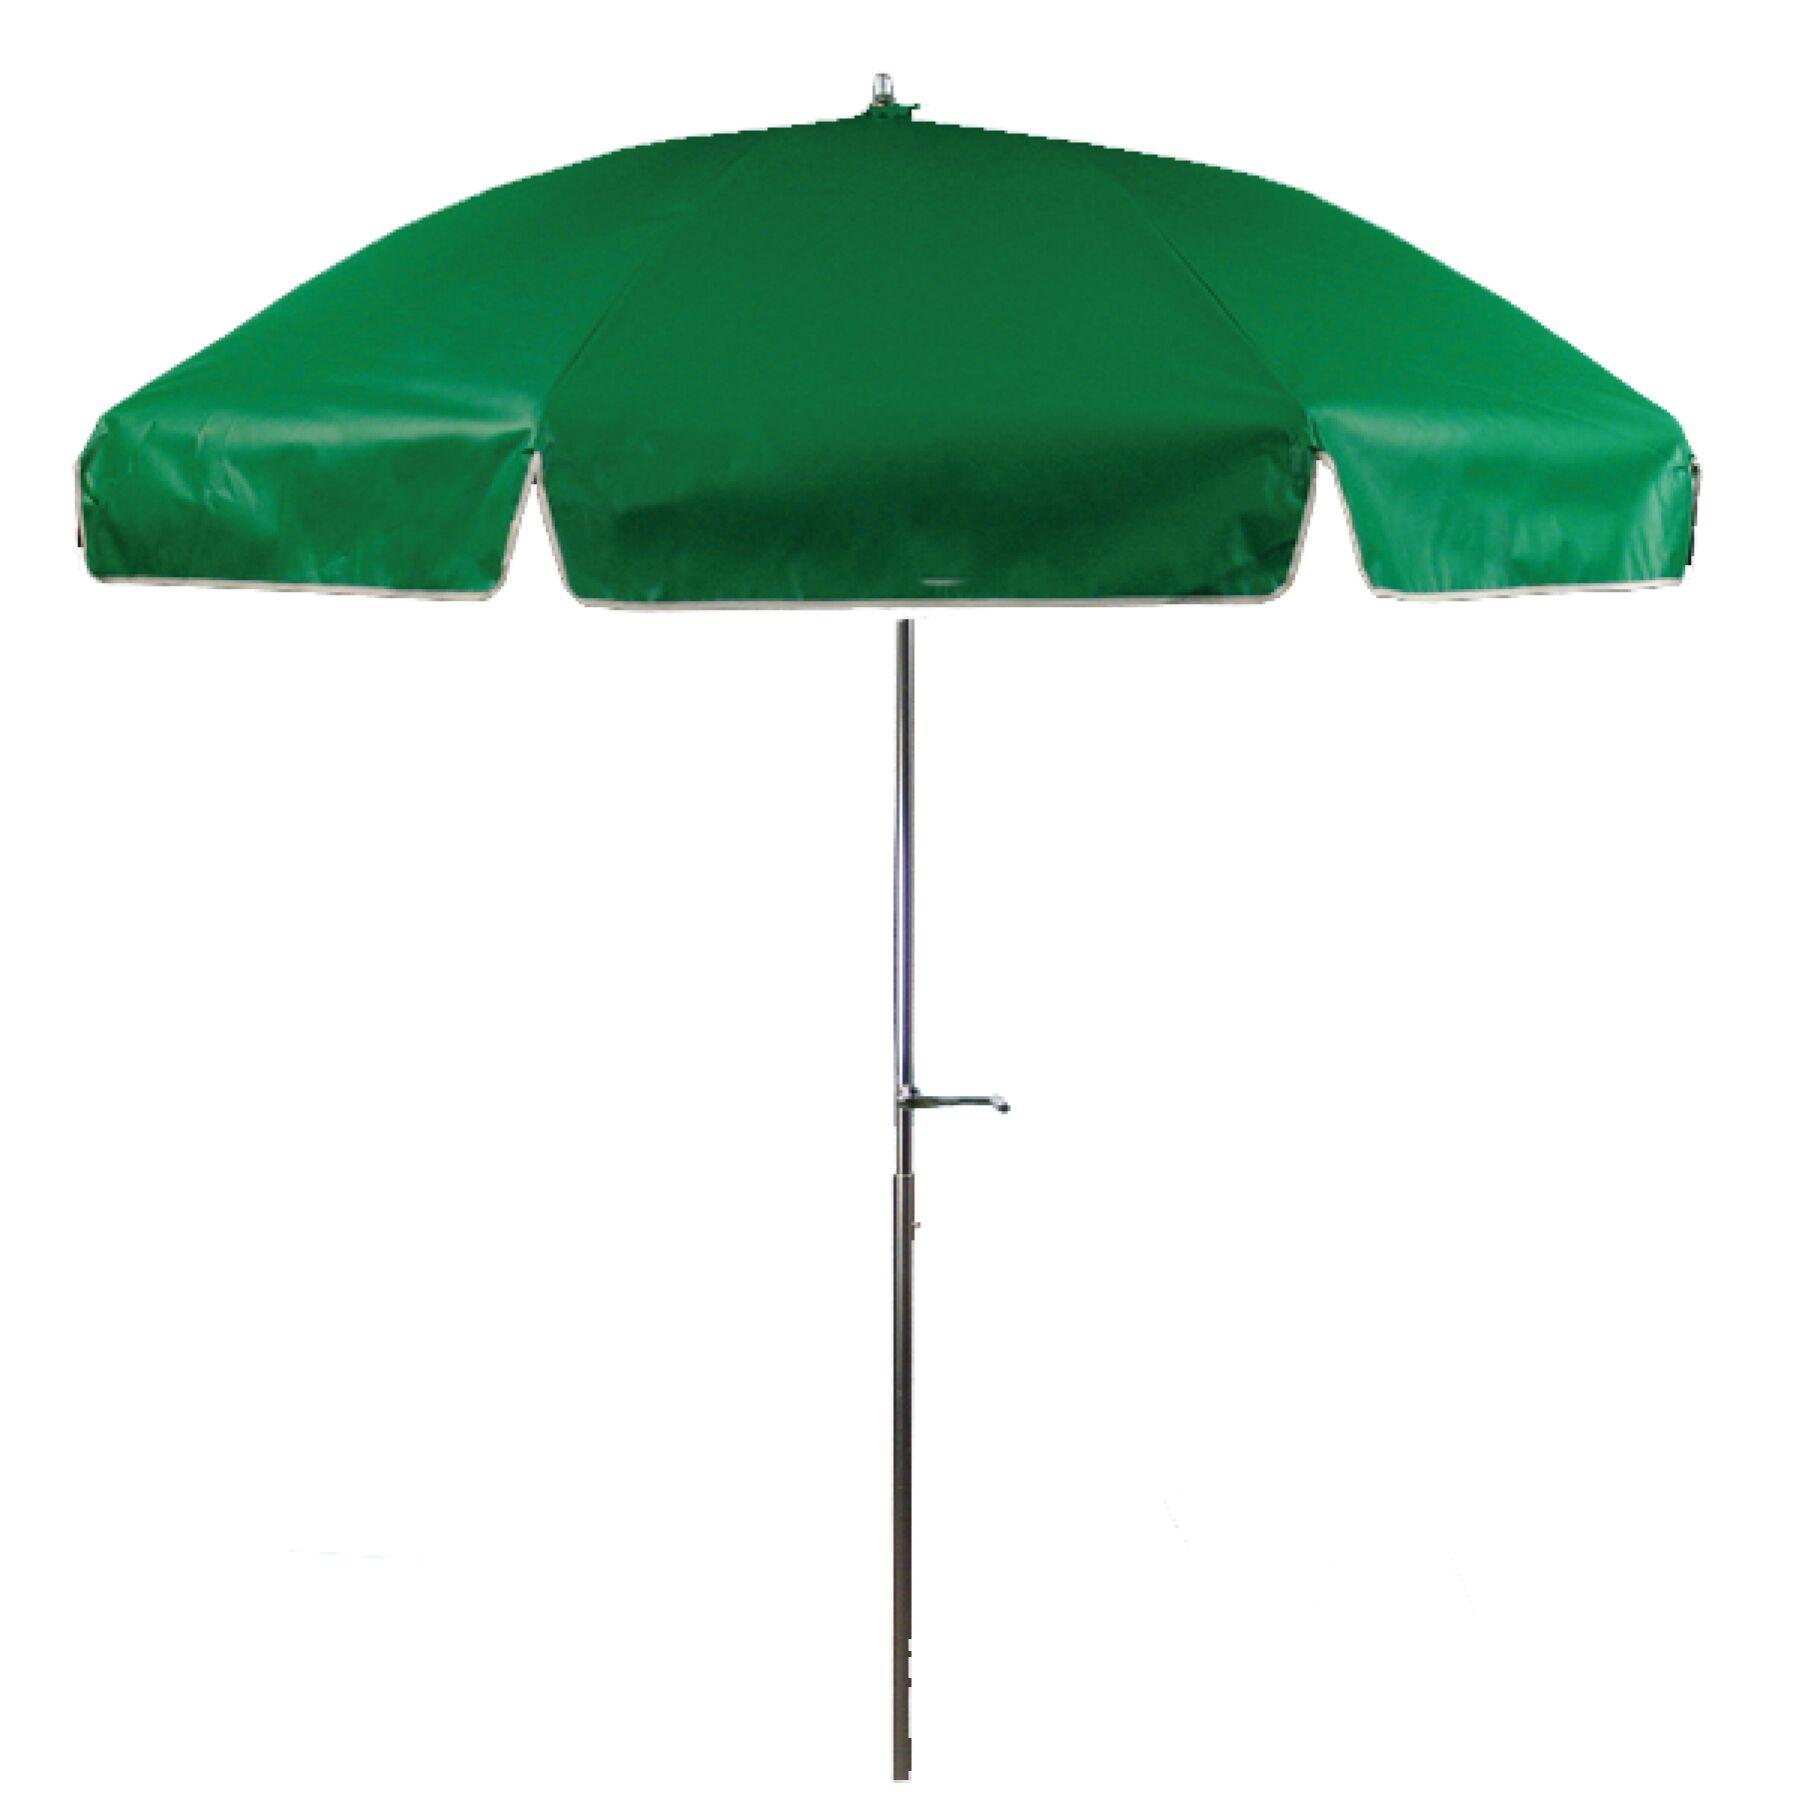 7.5' Beach Umbrella Fabric: Kelly Green